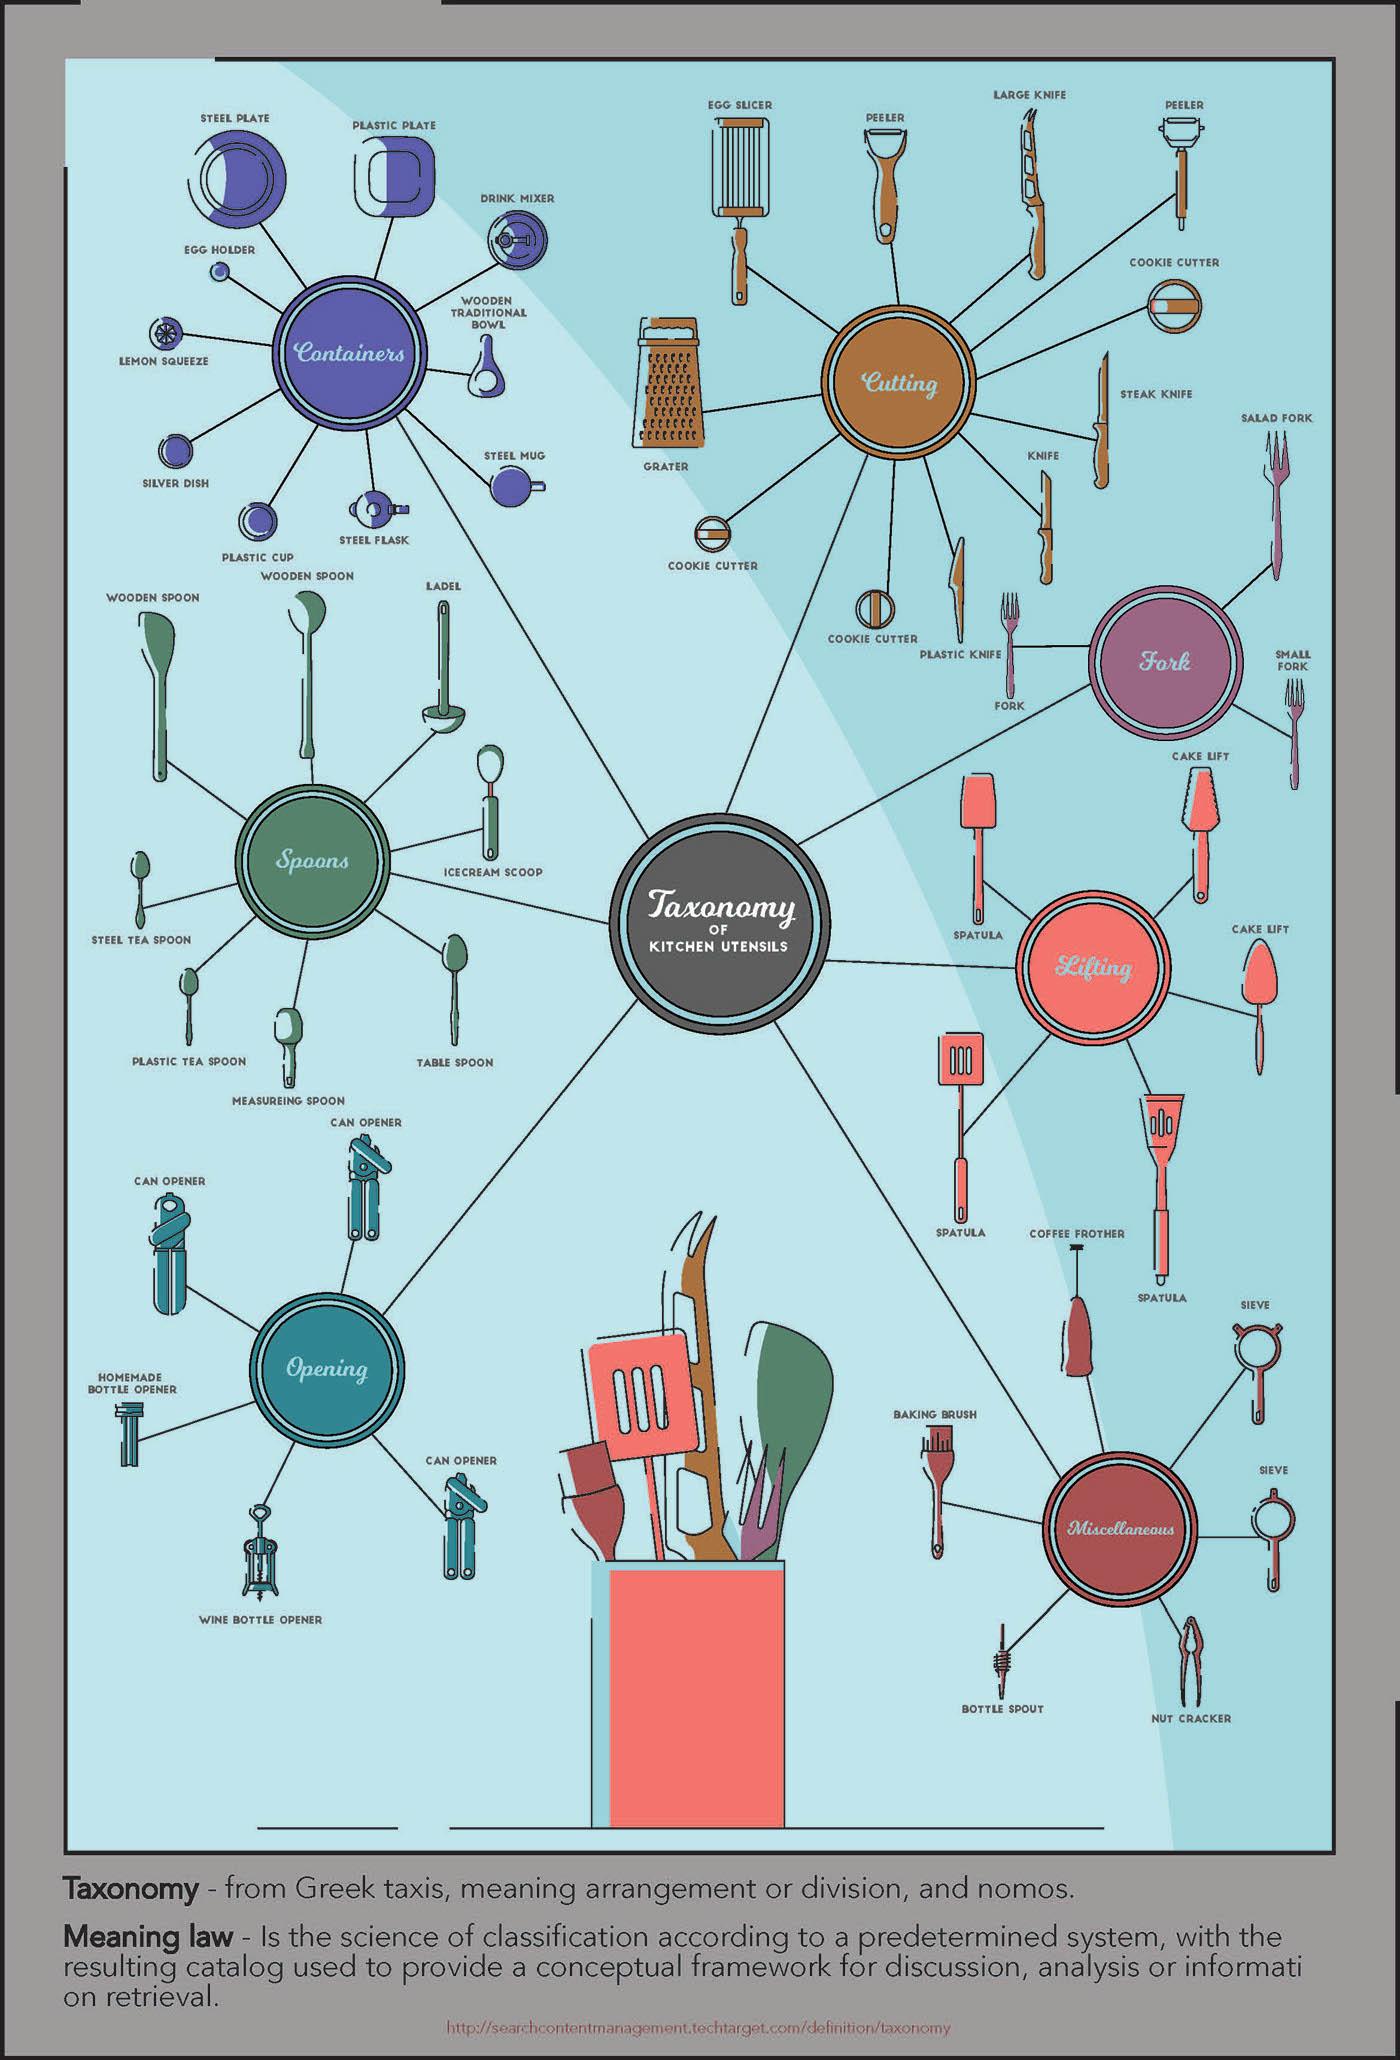 Taxonomy of kitchen utensils. on Behance